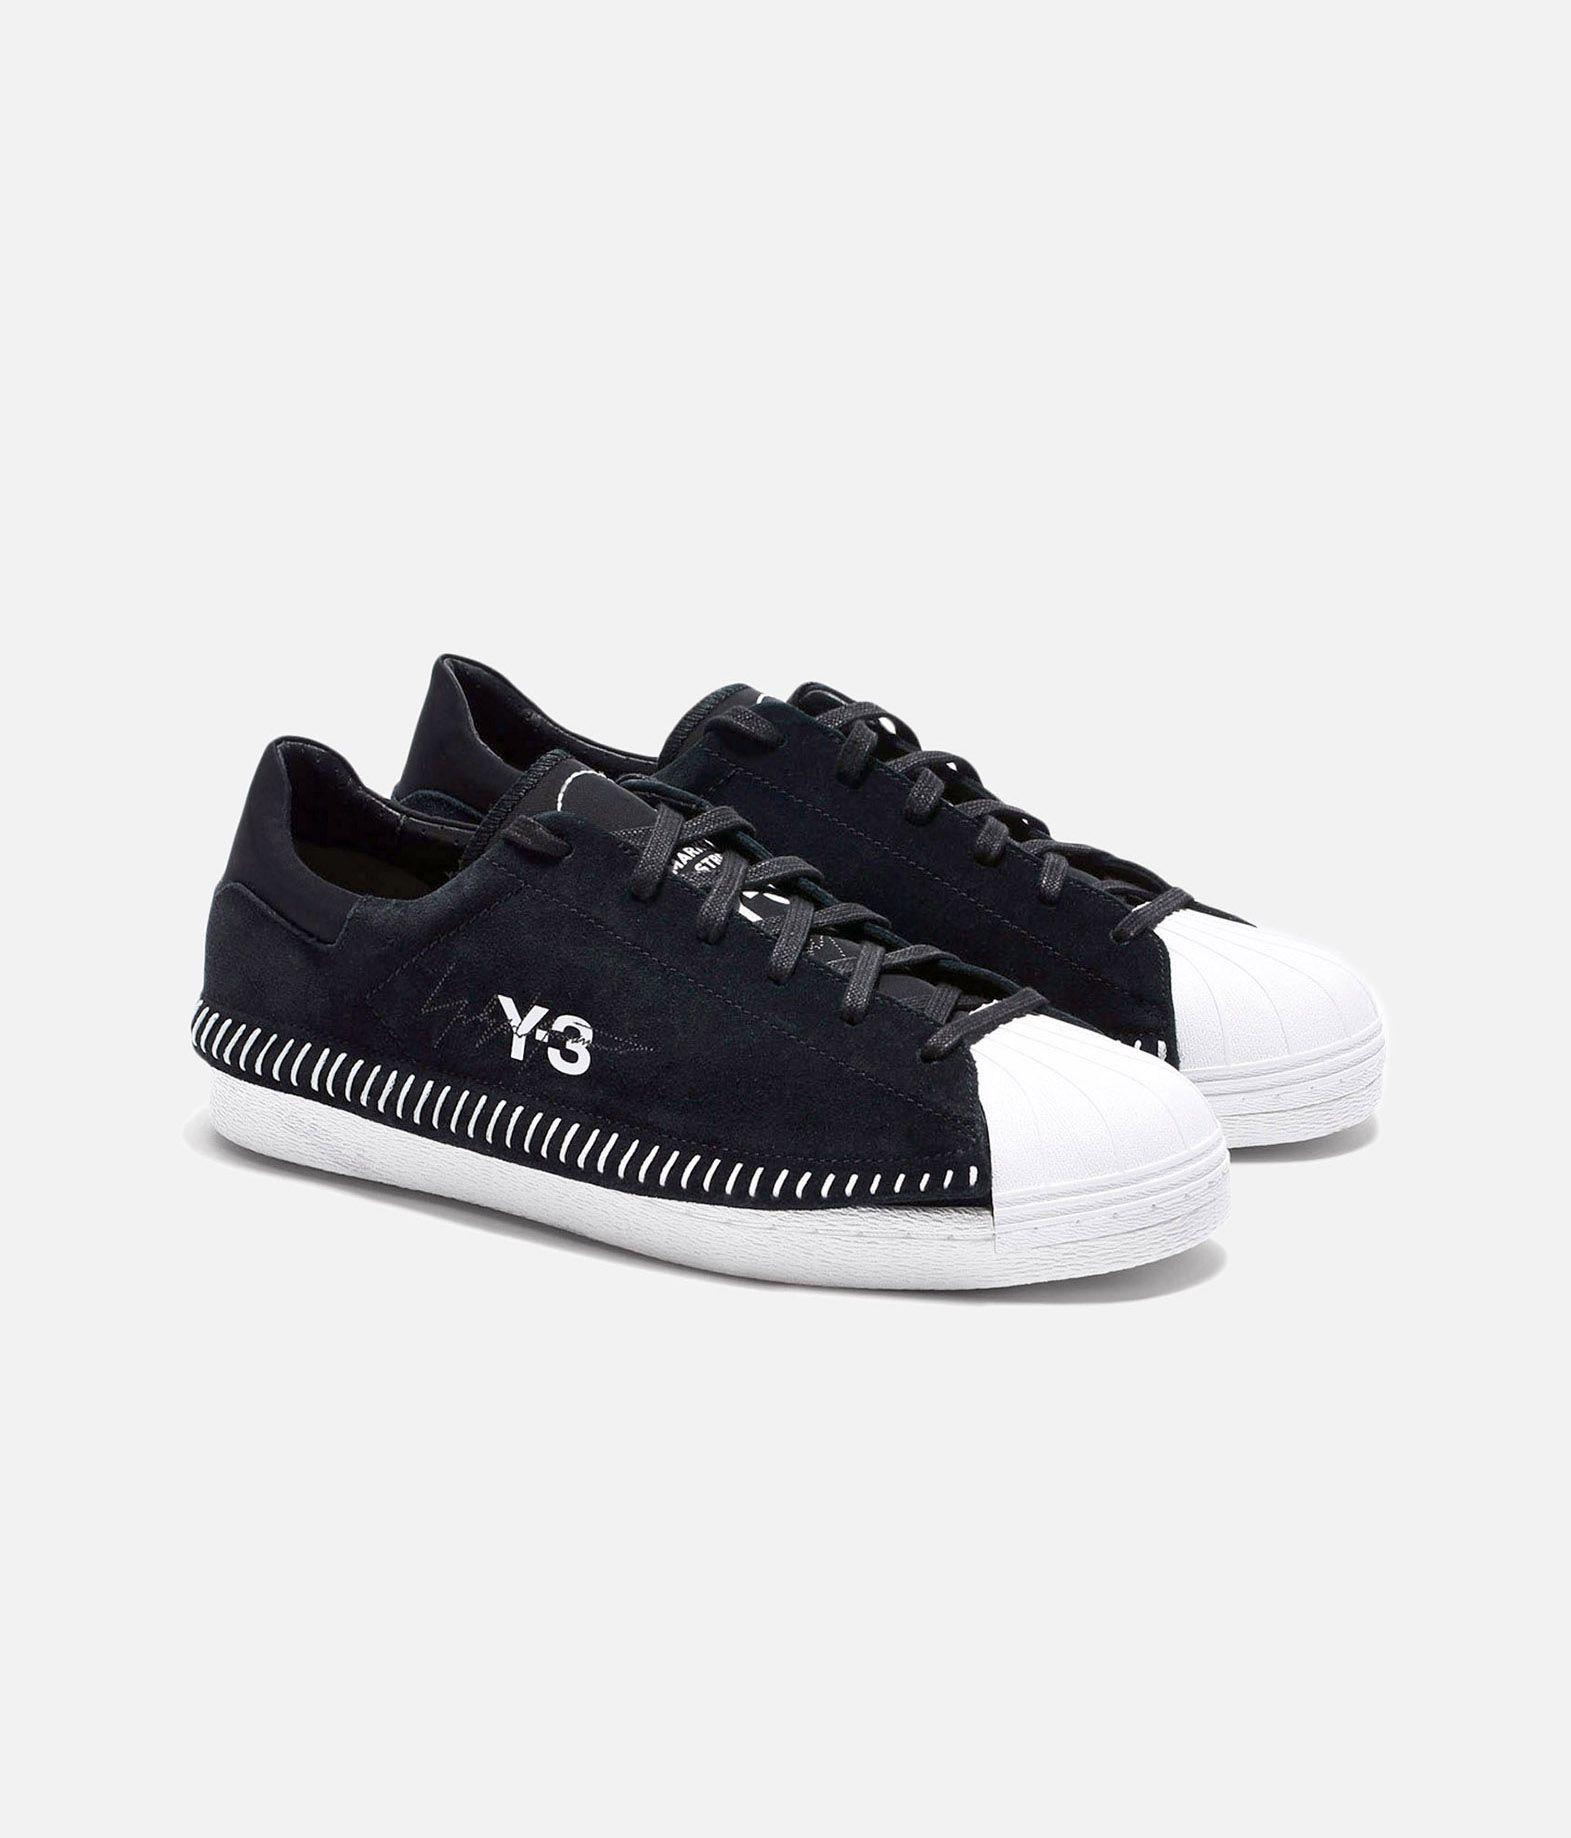 f159b4ae5  Y 3 Bynder Super Sneakers Black